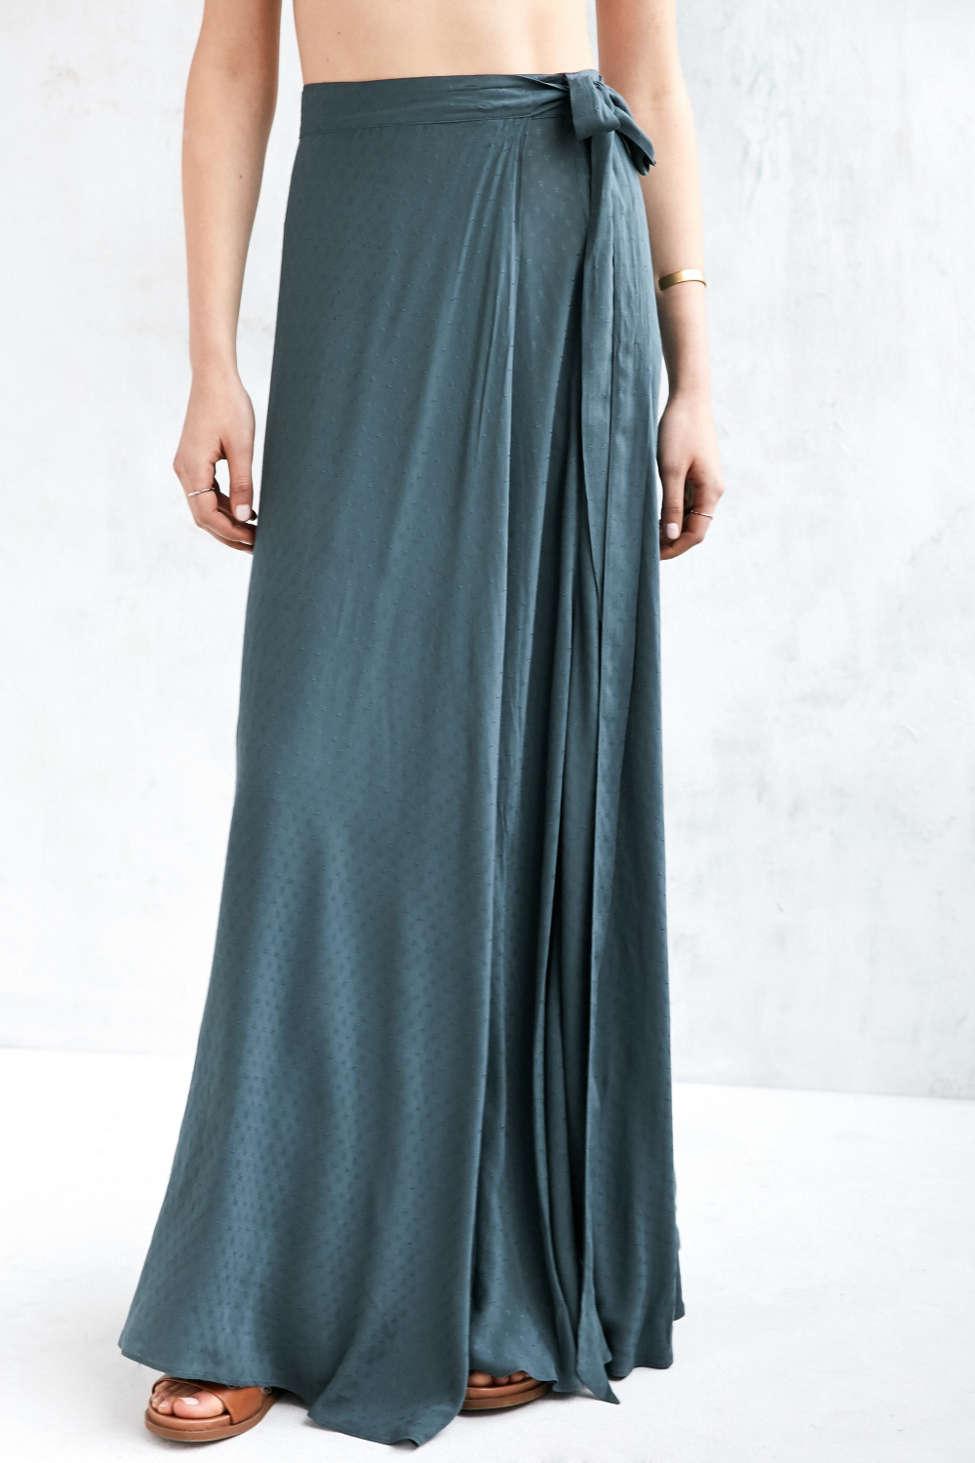 Ecote Zella Boho Wrap Maxi Skirt